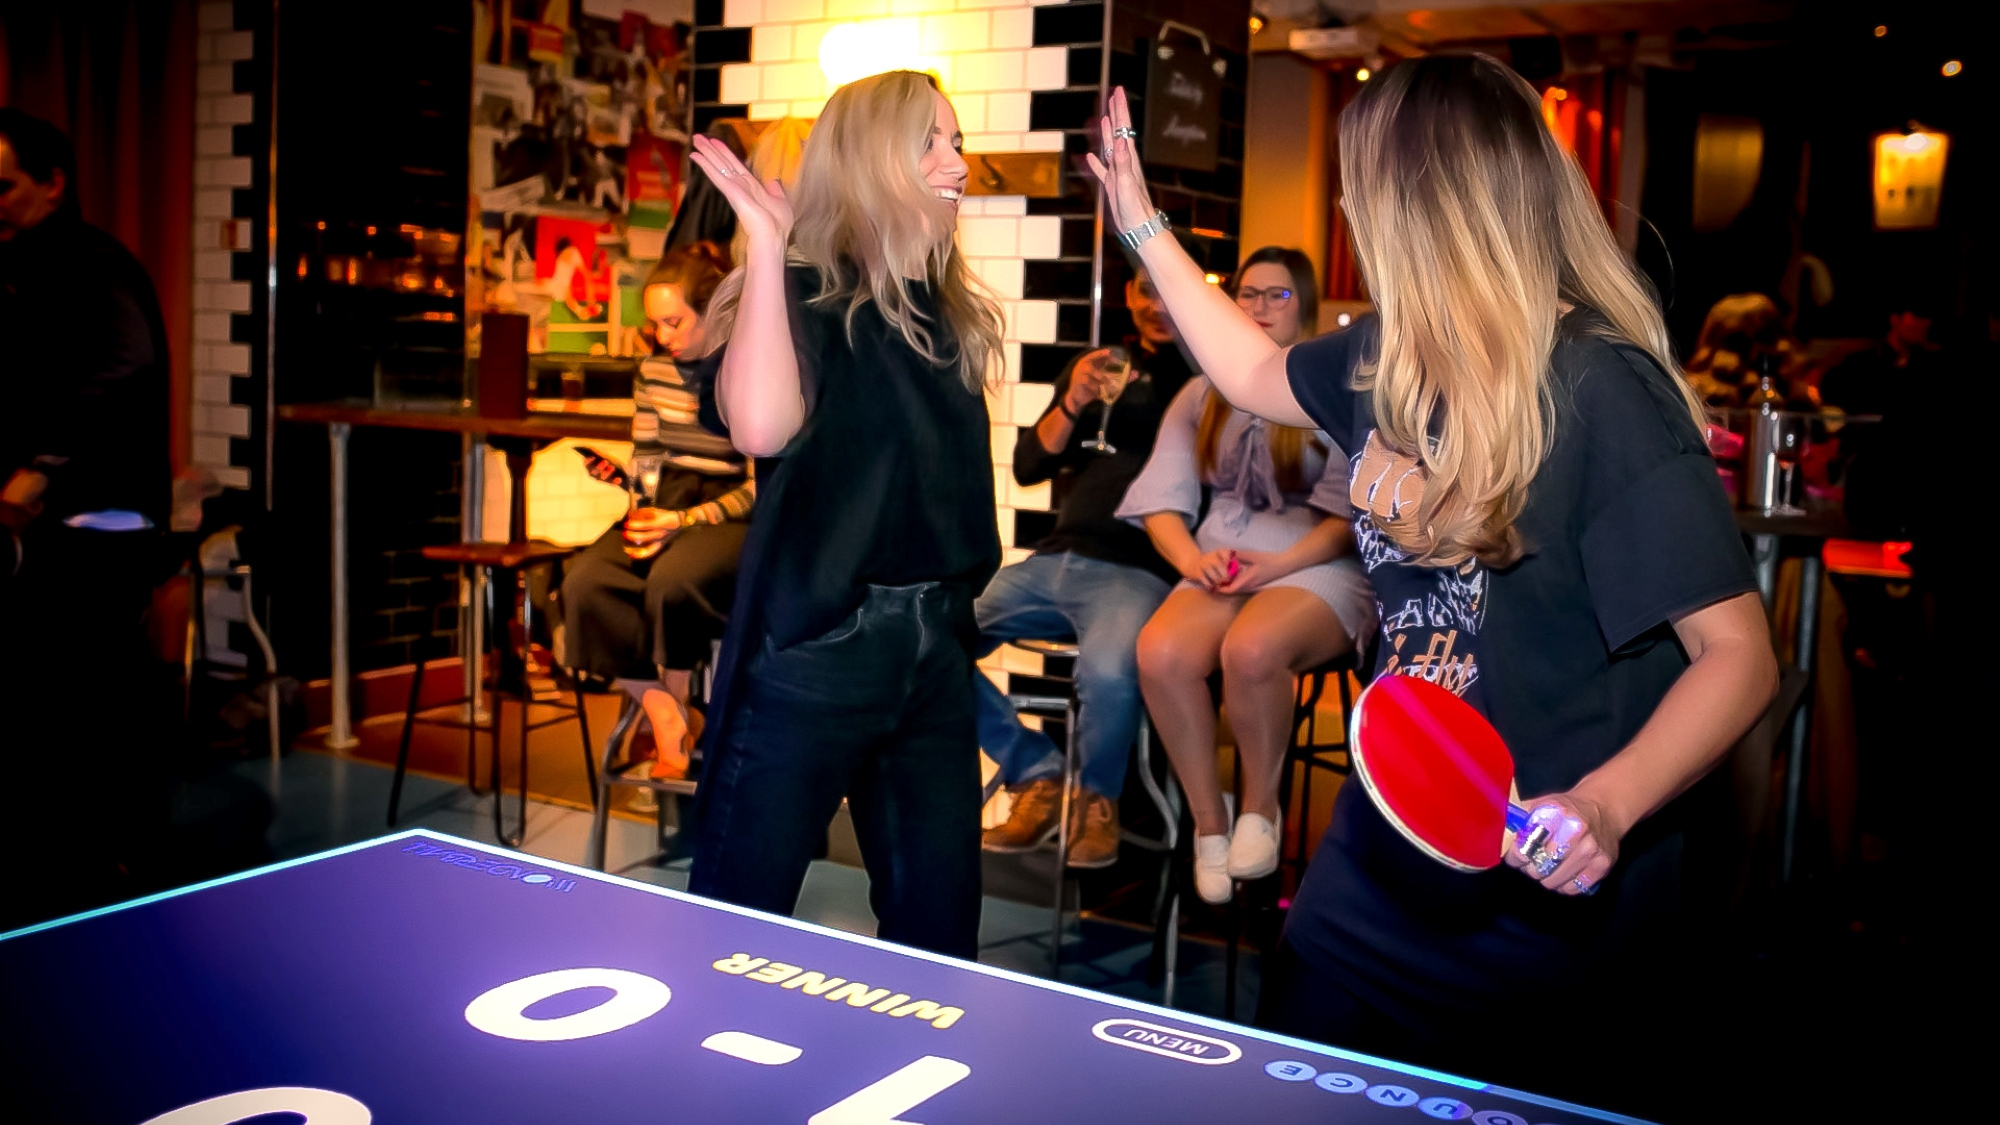 Bounce ping pong bar